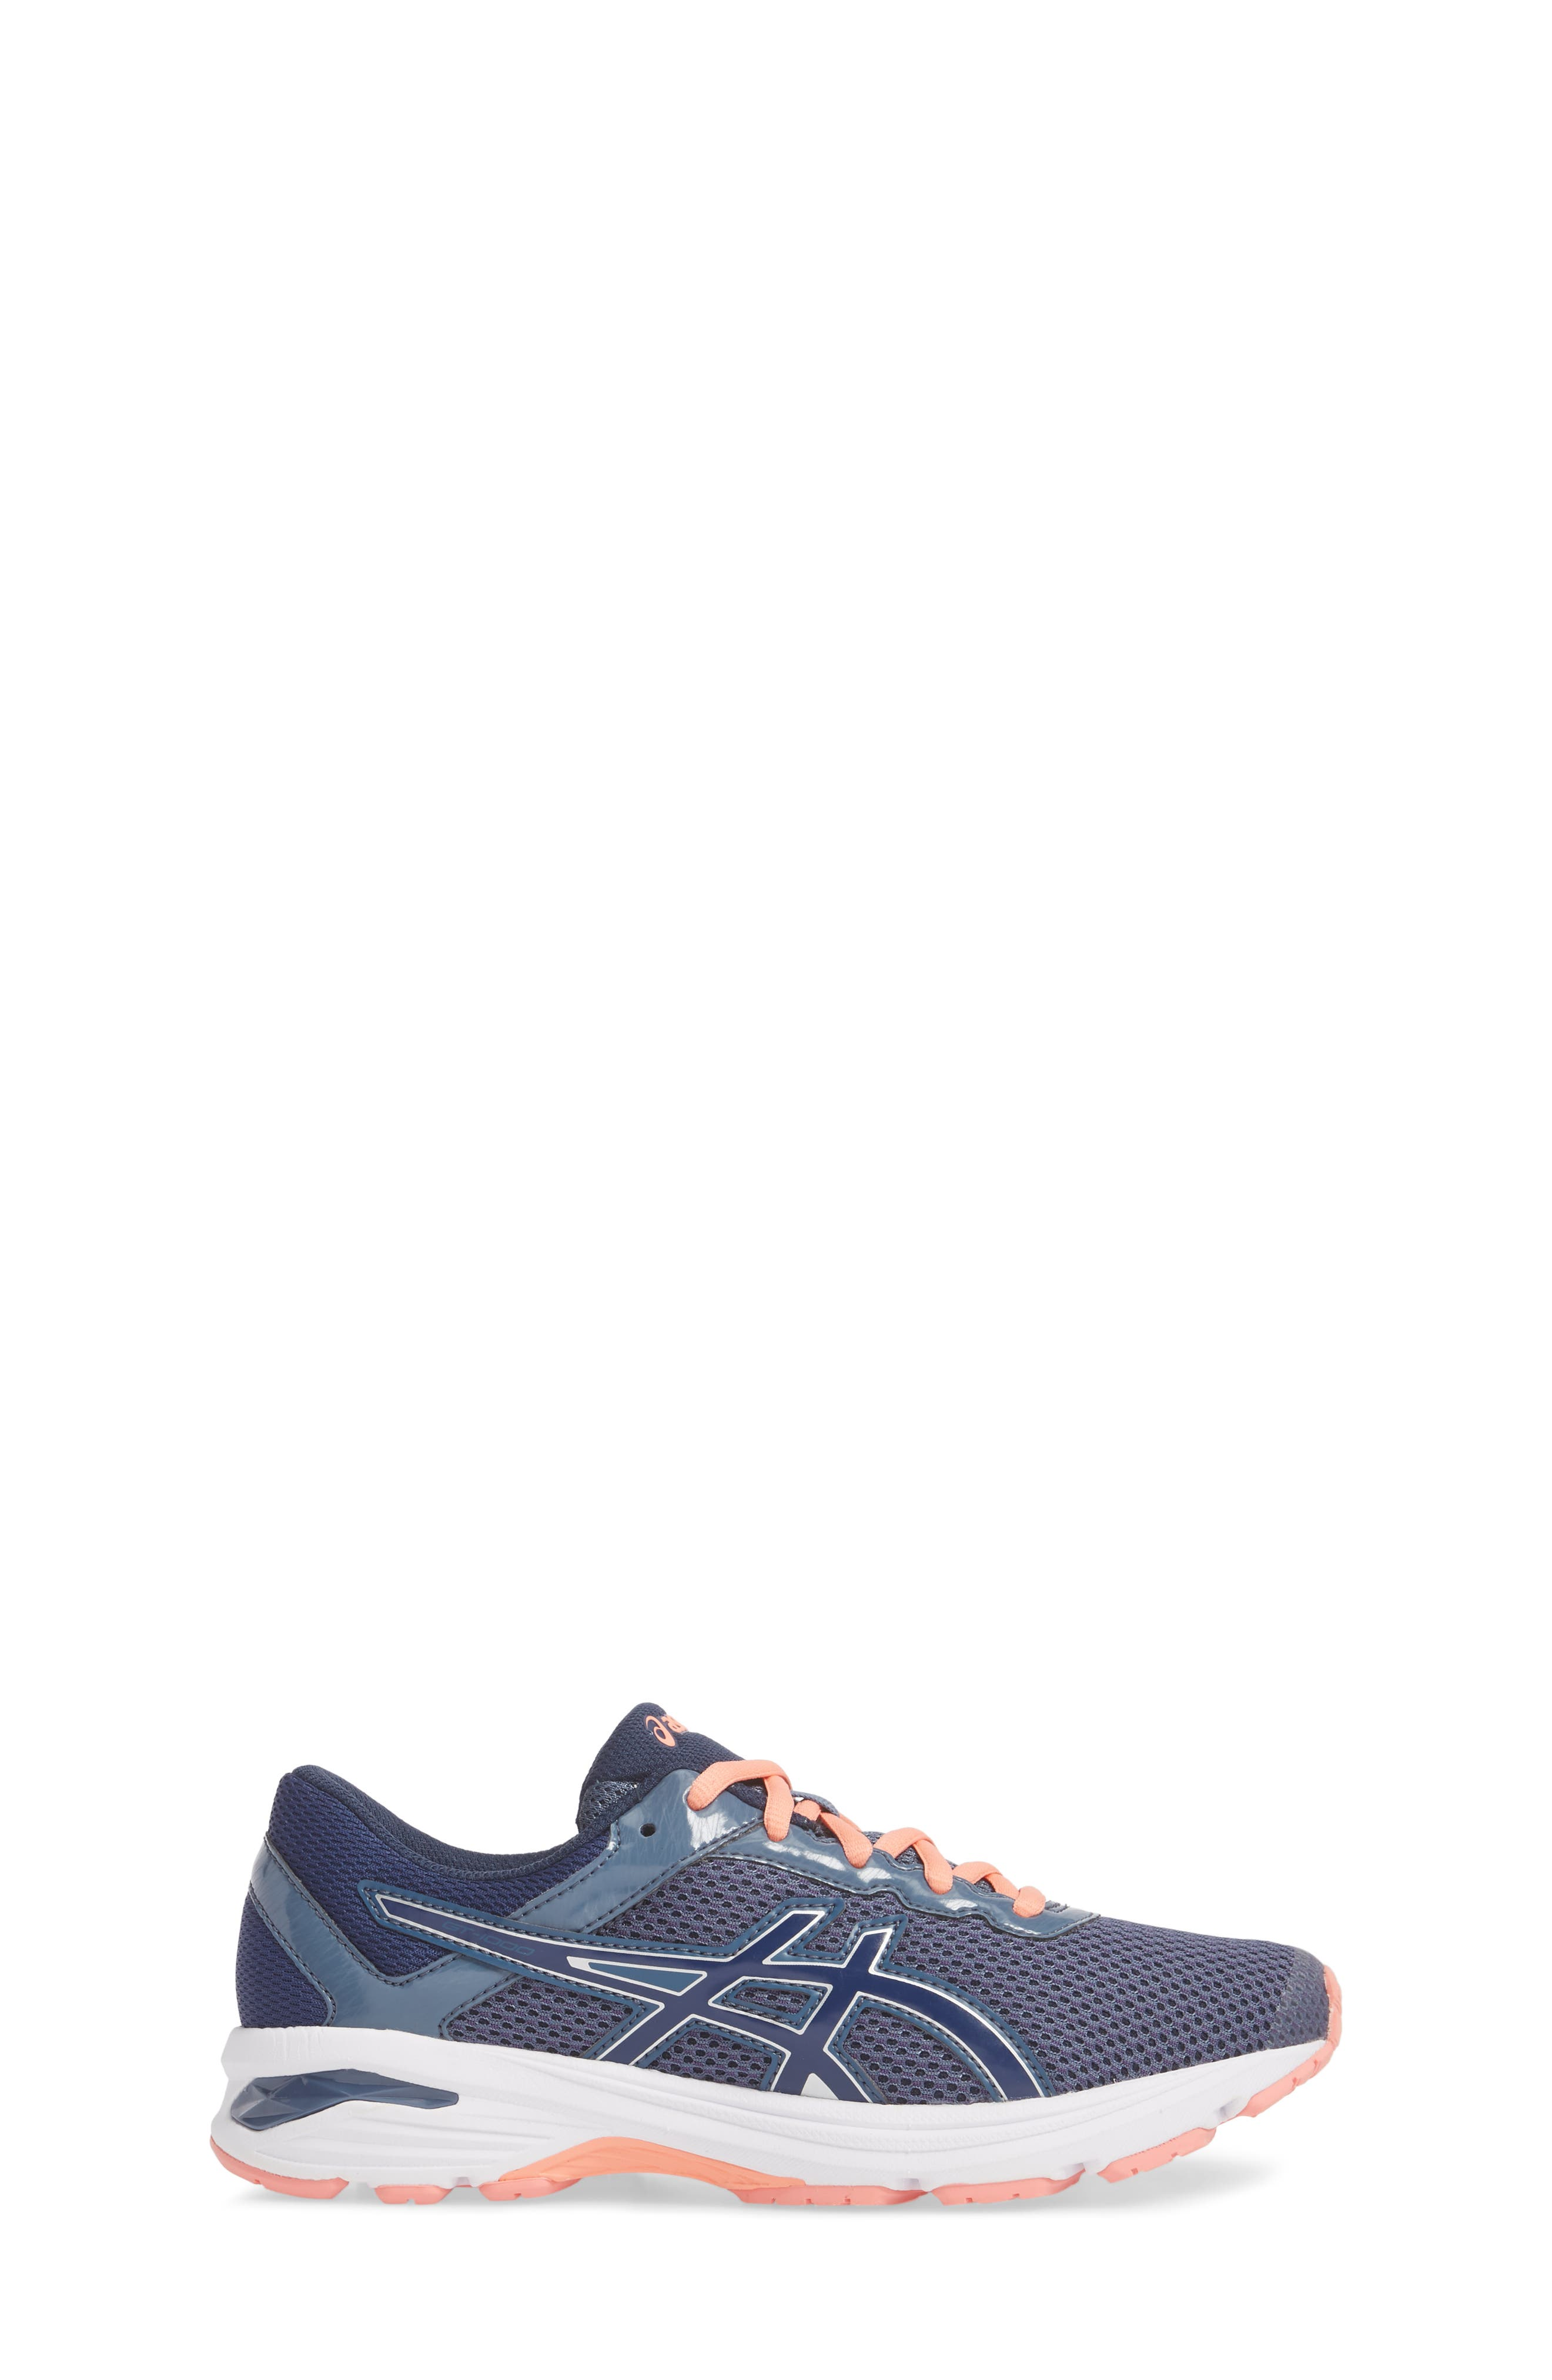 Asics GT-1000<sup>™</sup> 6 GS Sneaker,                             Alternate thumbnail 13, color,